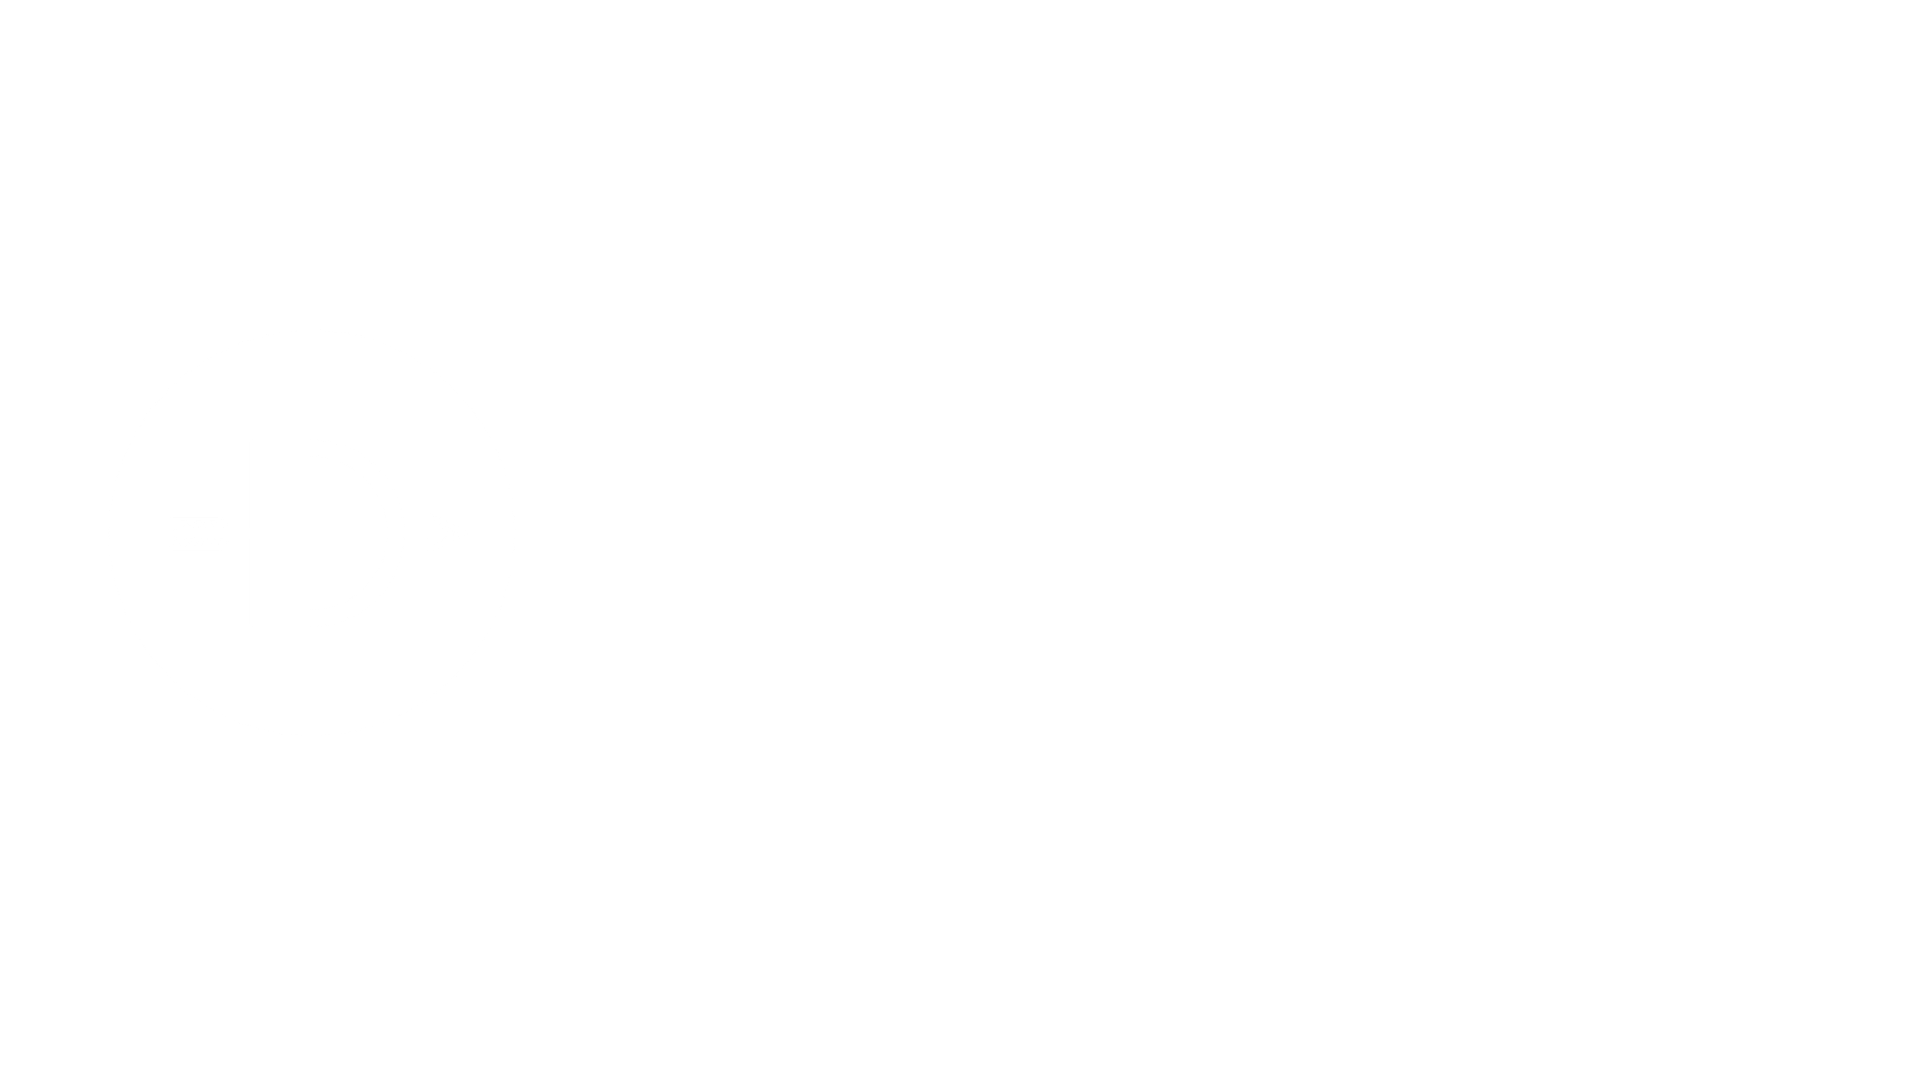 School of Leadership Development